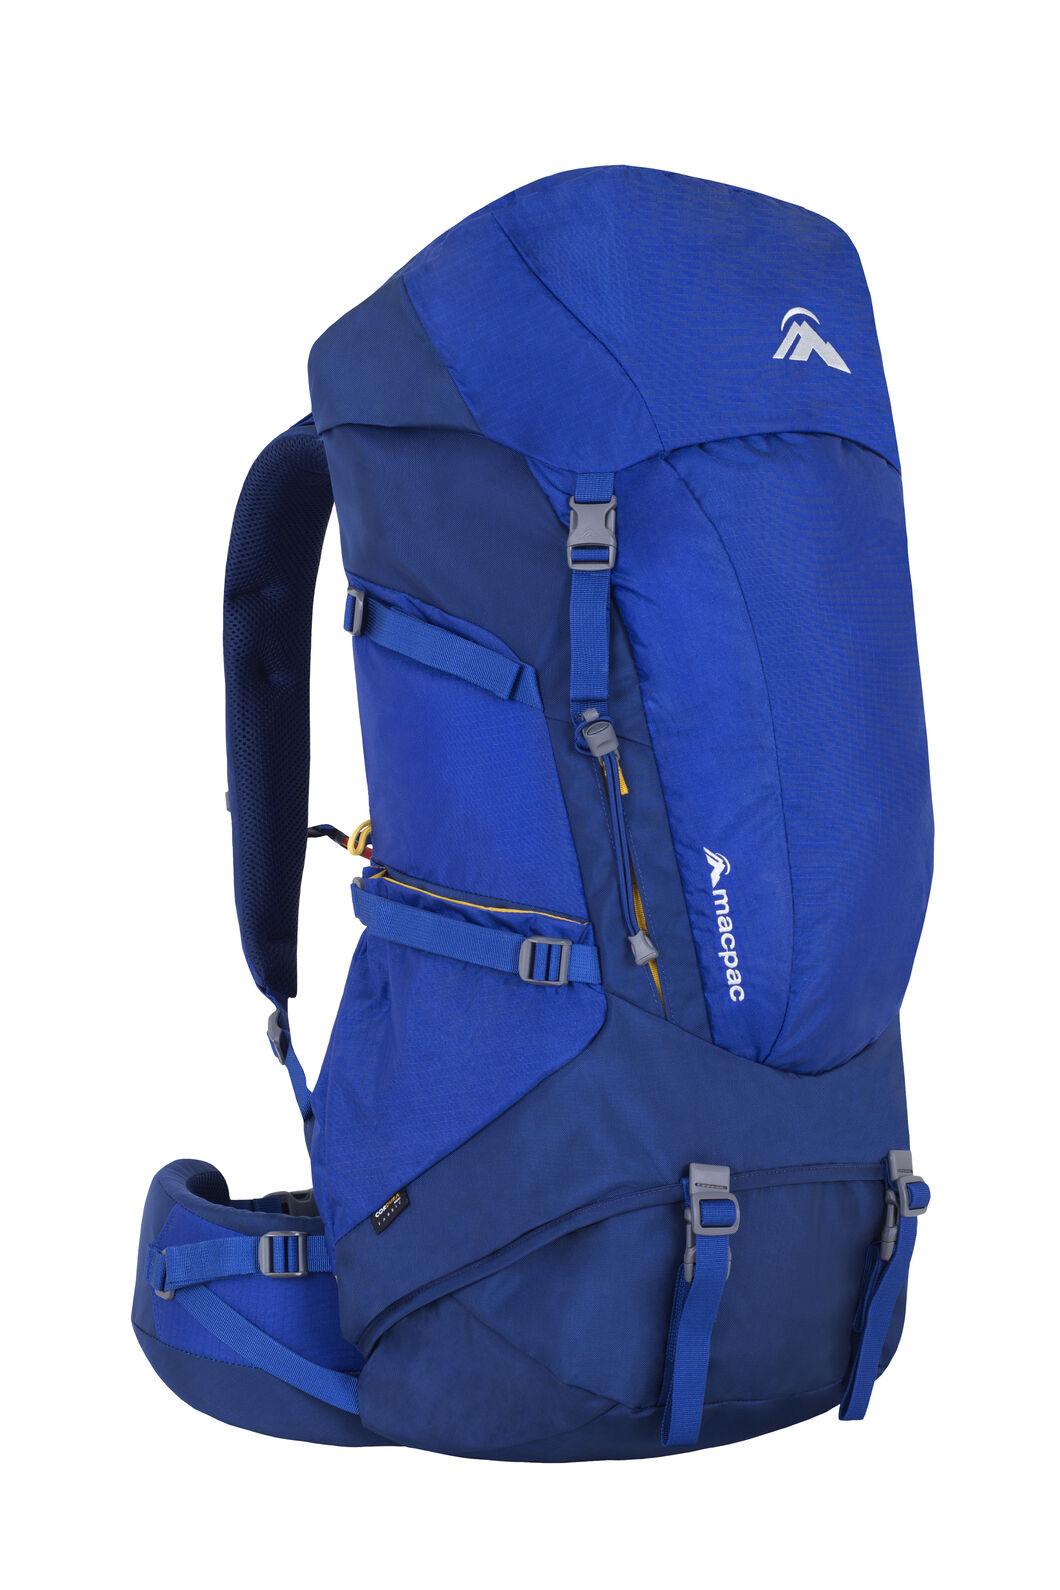 Macpac Torlesse 50L Pack, Surf The Web, hi-res